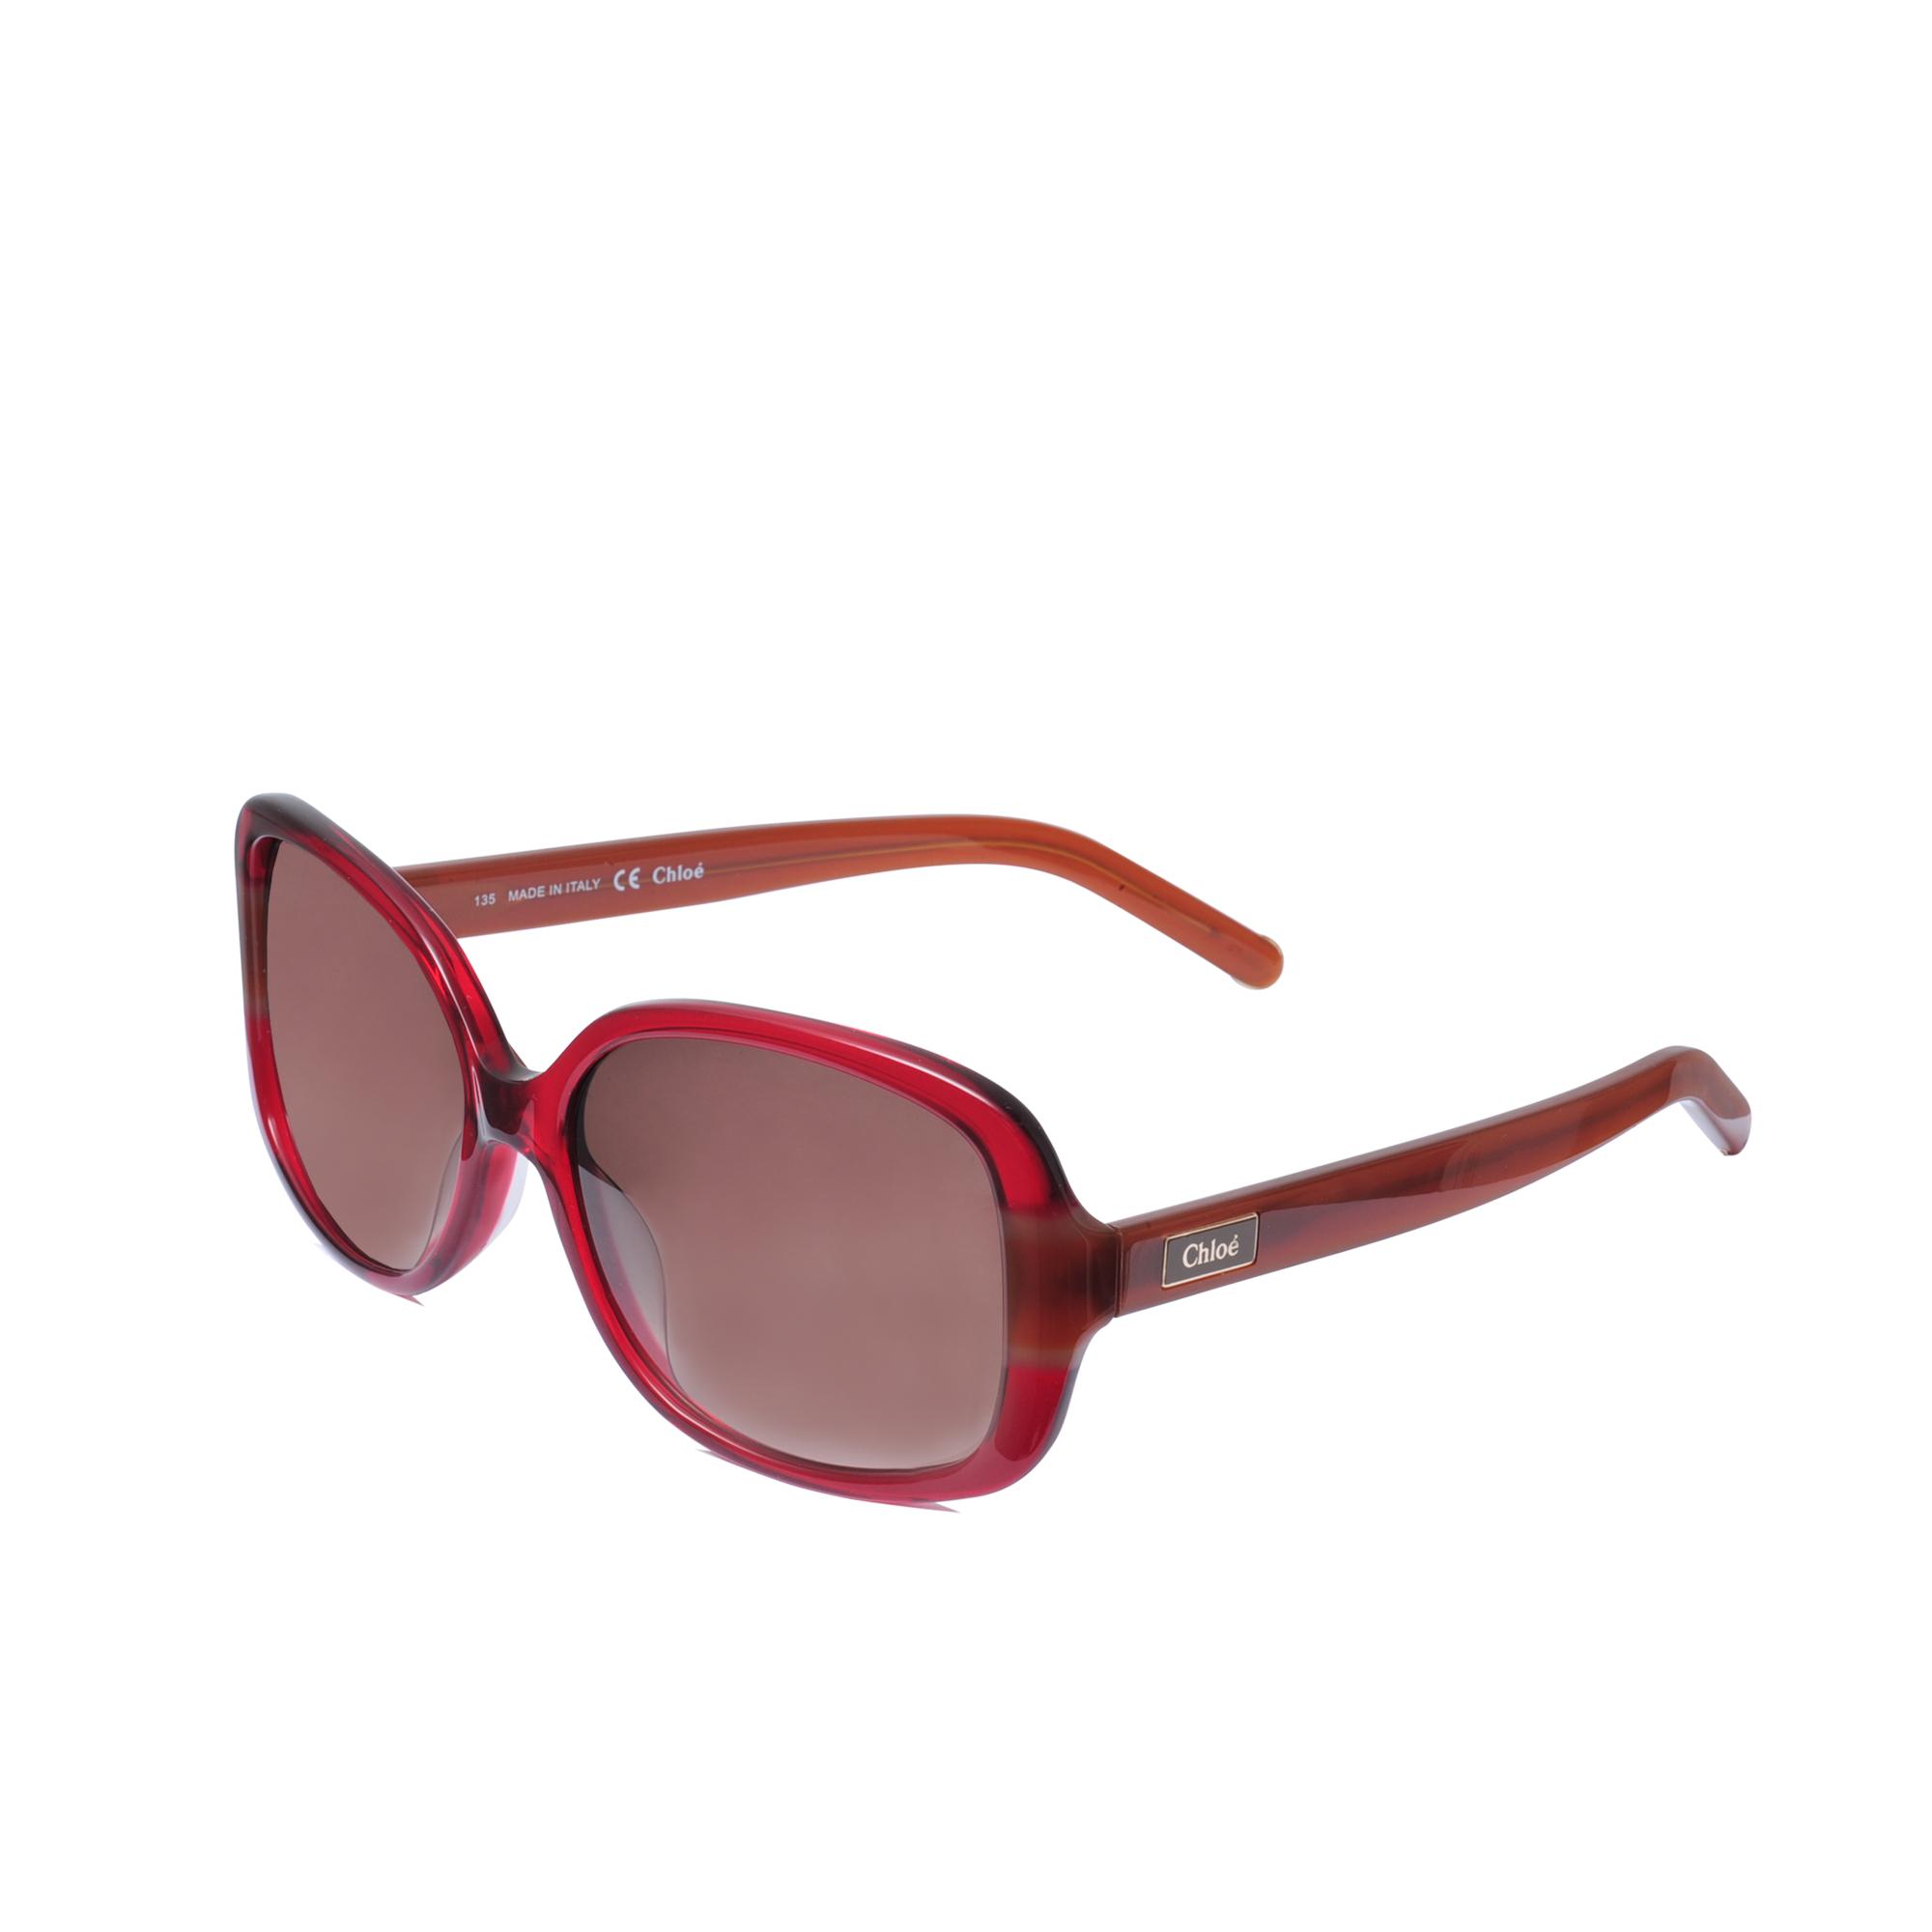 4ec172bfb2b Chloé Ce610S Sunglasses in Purple - Lyst